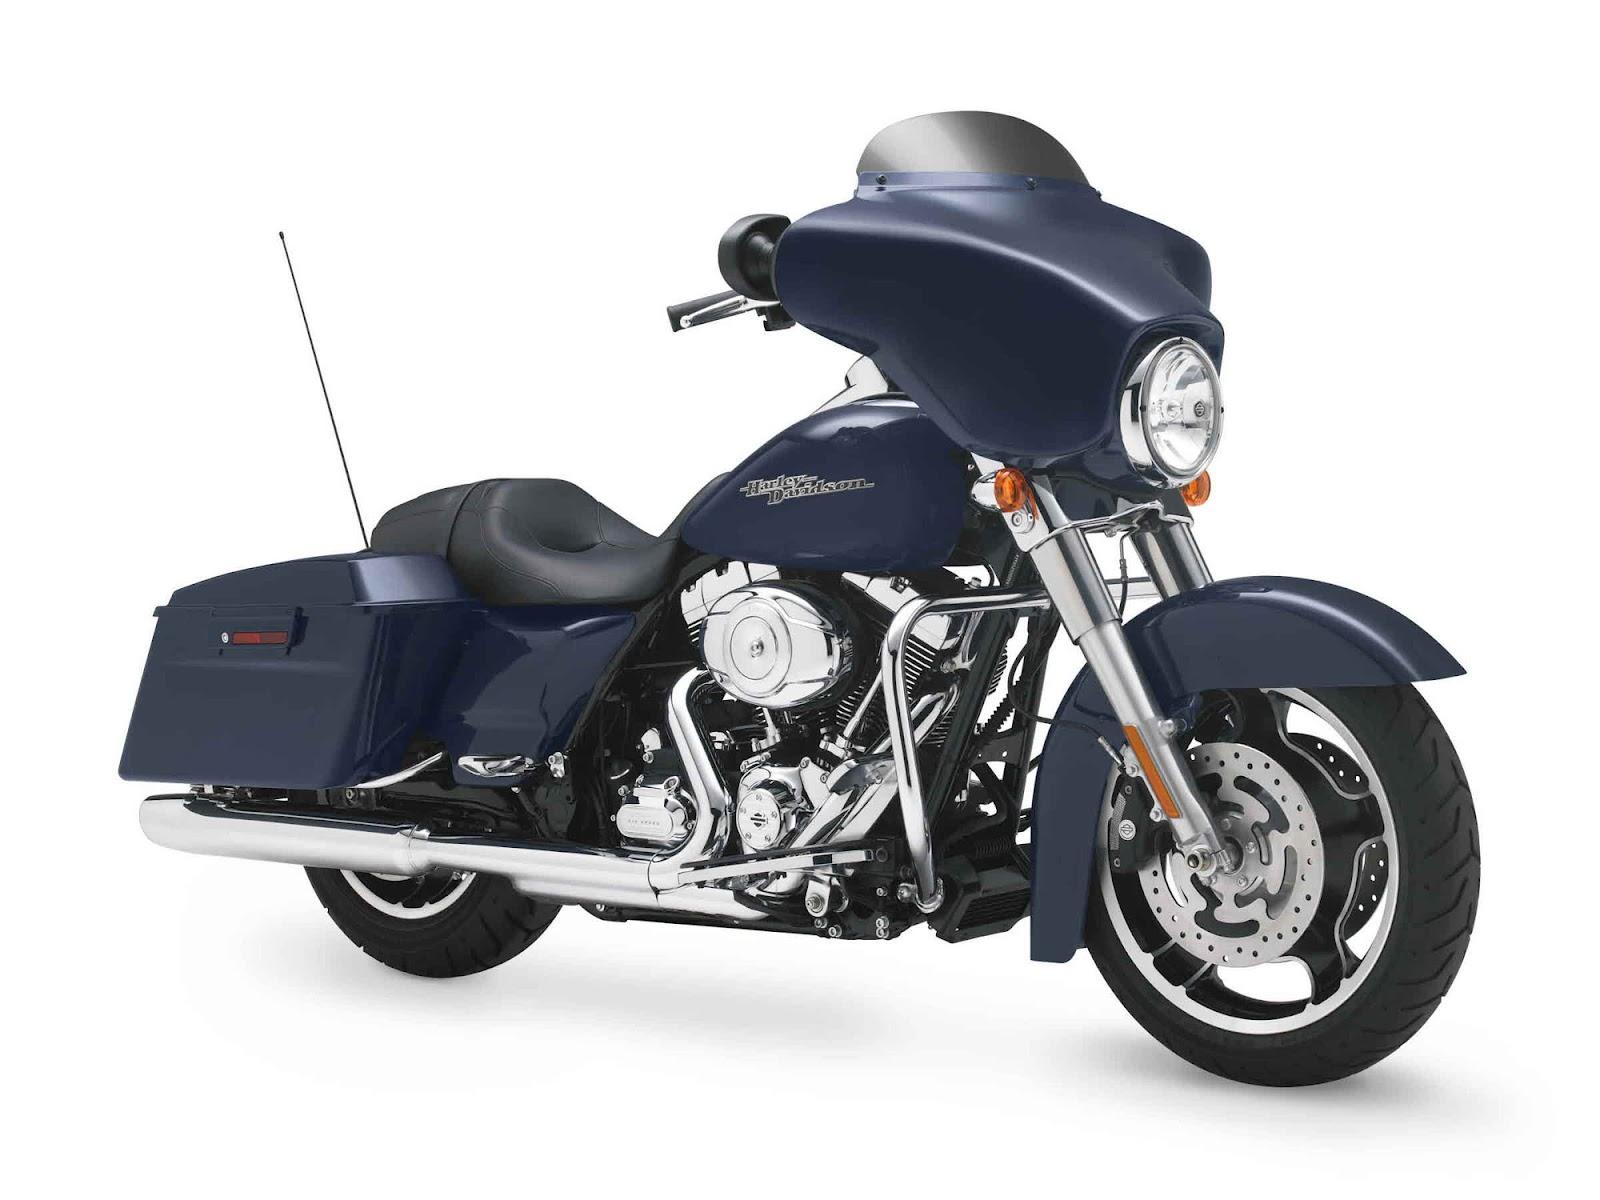 2015 Harley Davidson Tri Glide Motorcycle Buy Steroid Online 2013 Road Wiring Diagram Street For 2012 Get Free Gauges